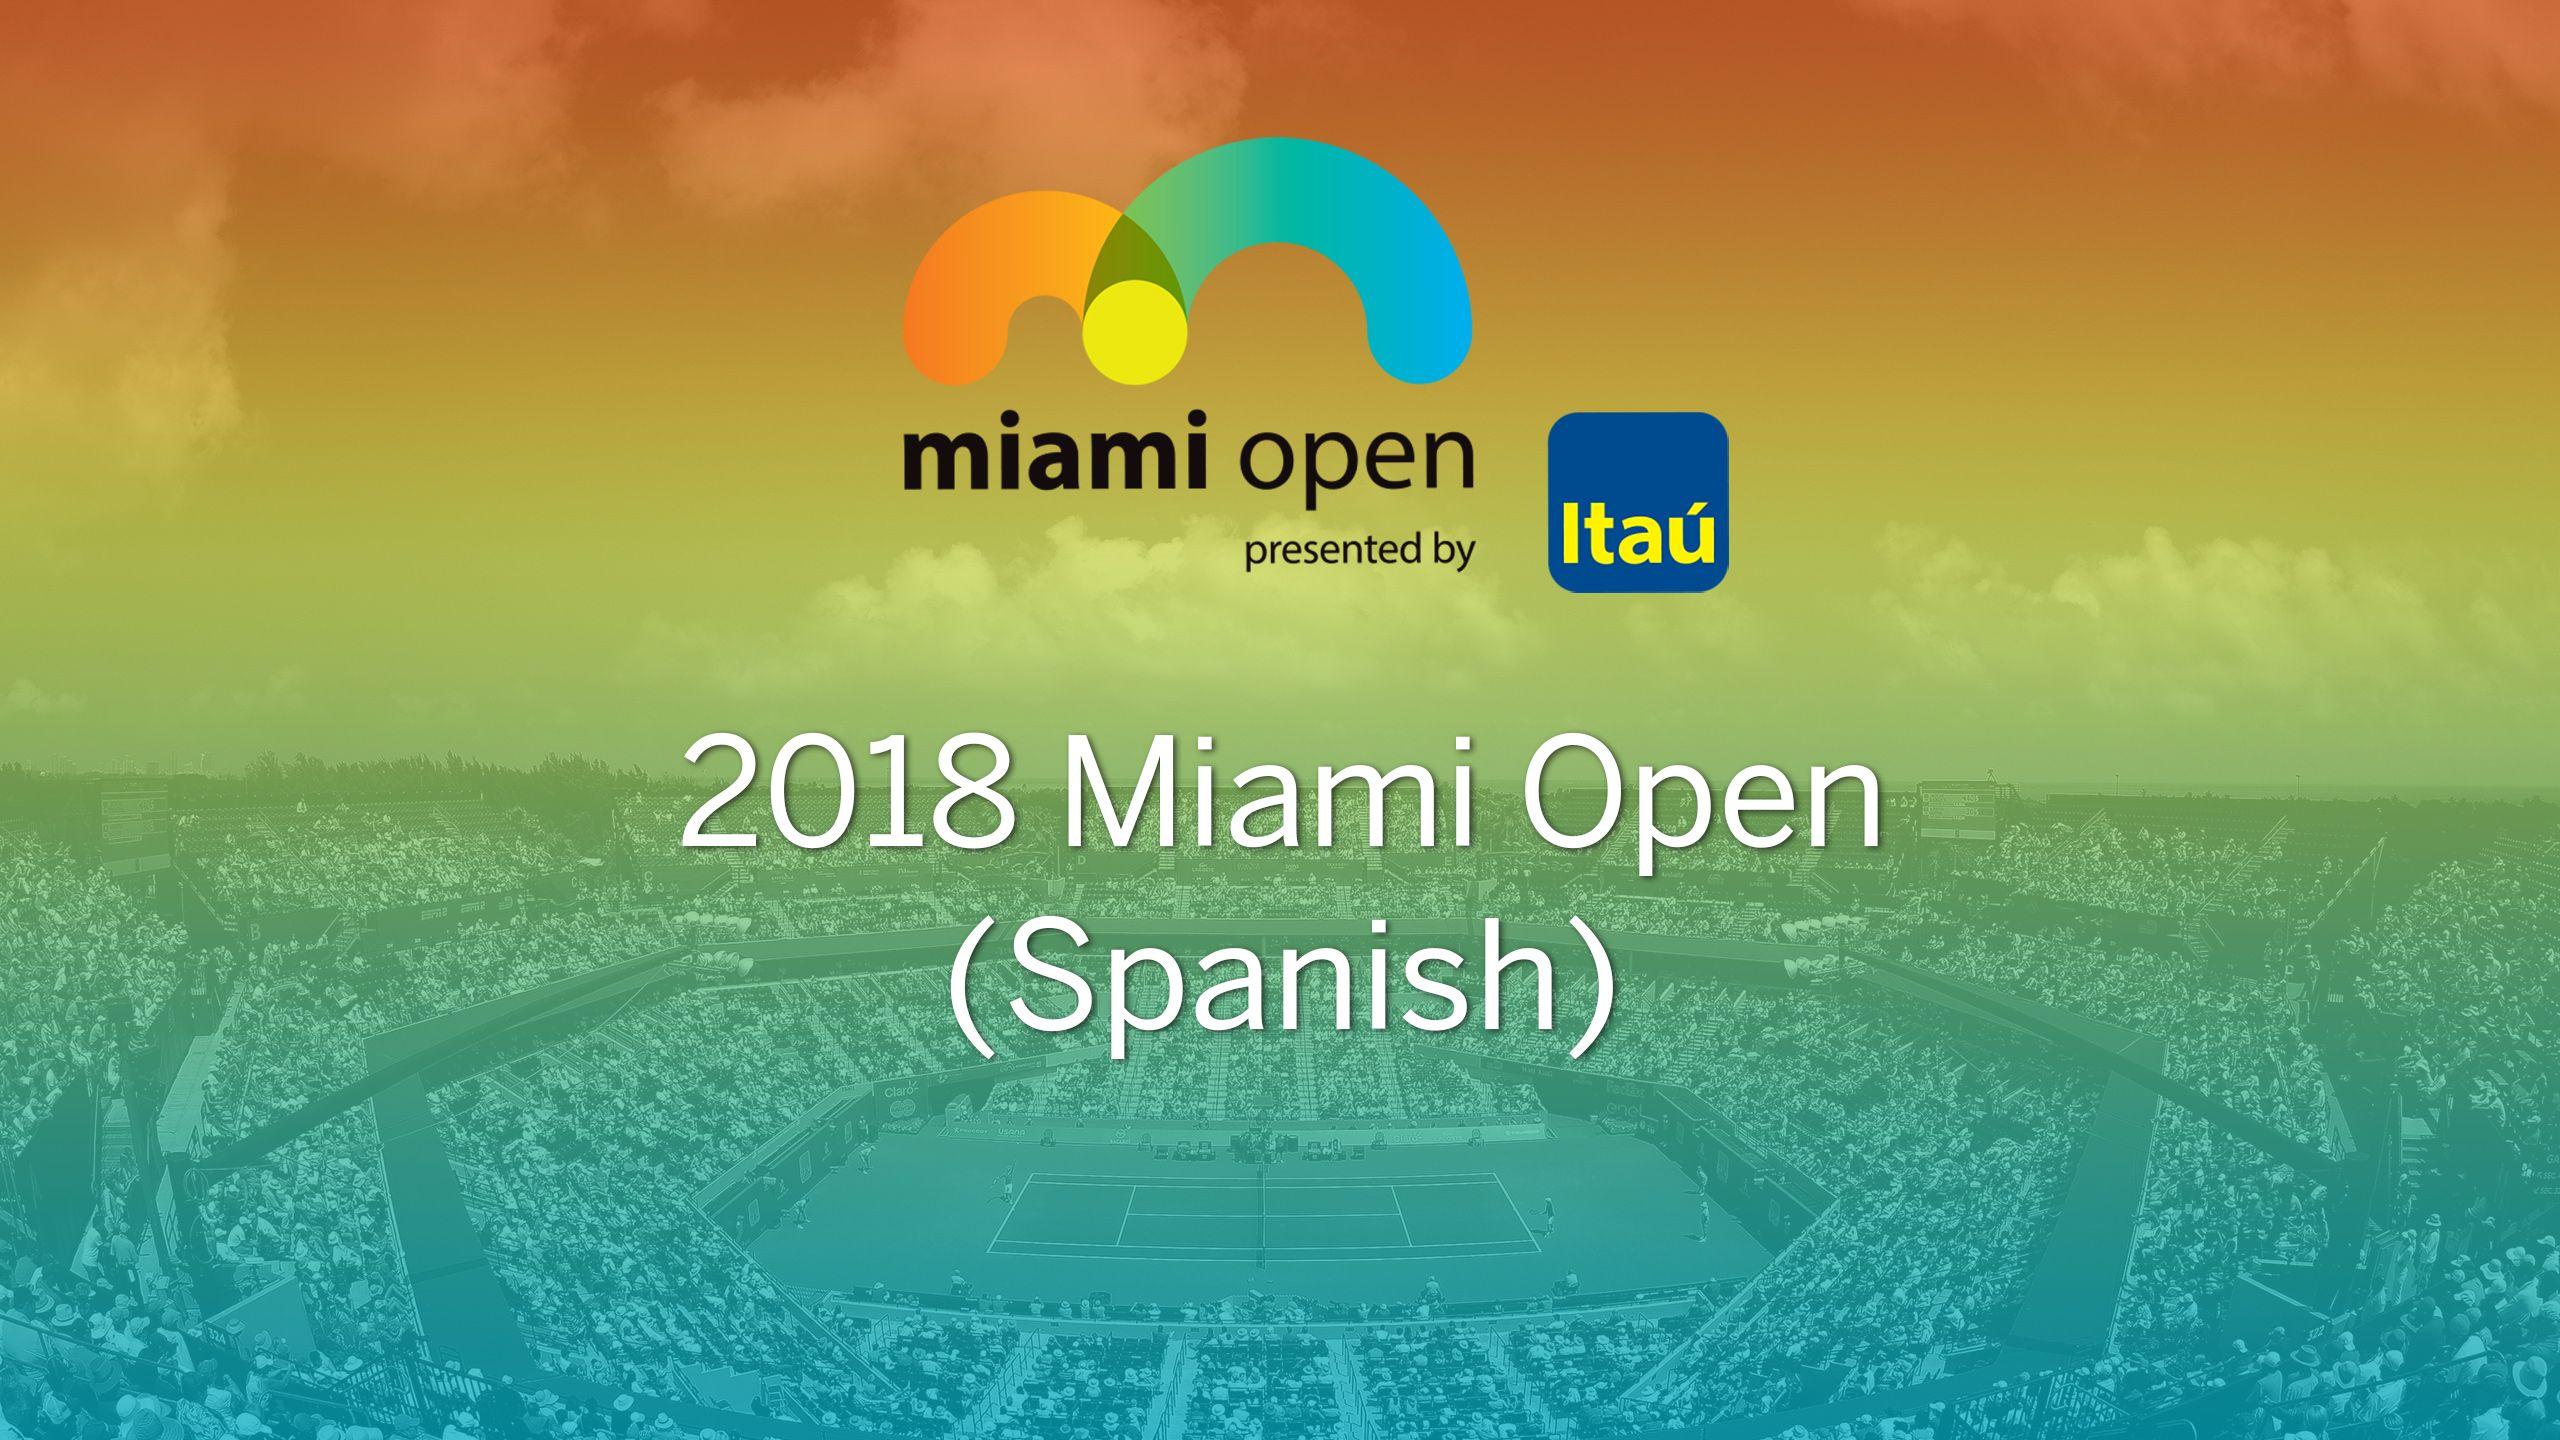 In Spanish - Miami Open (First Round)